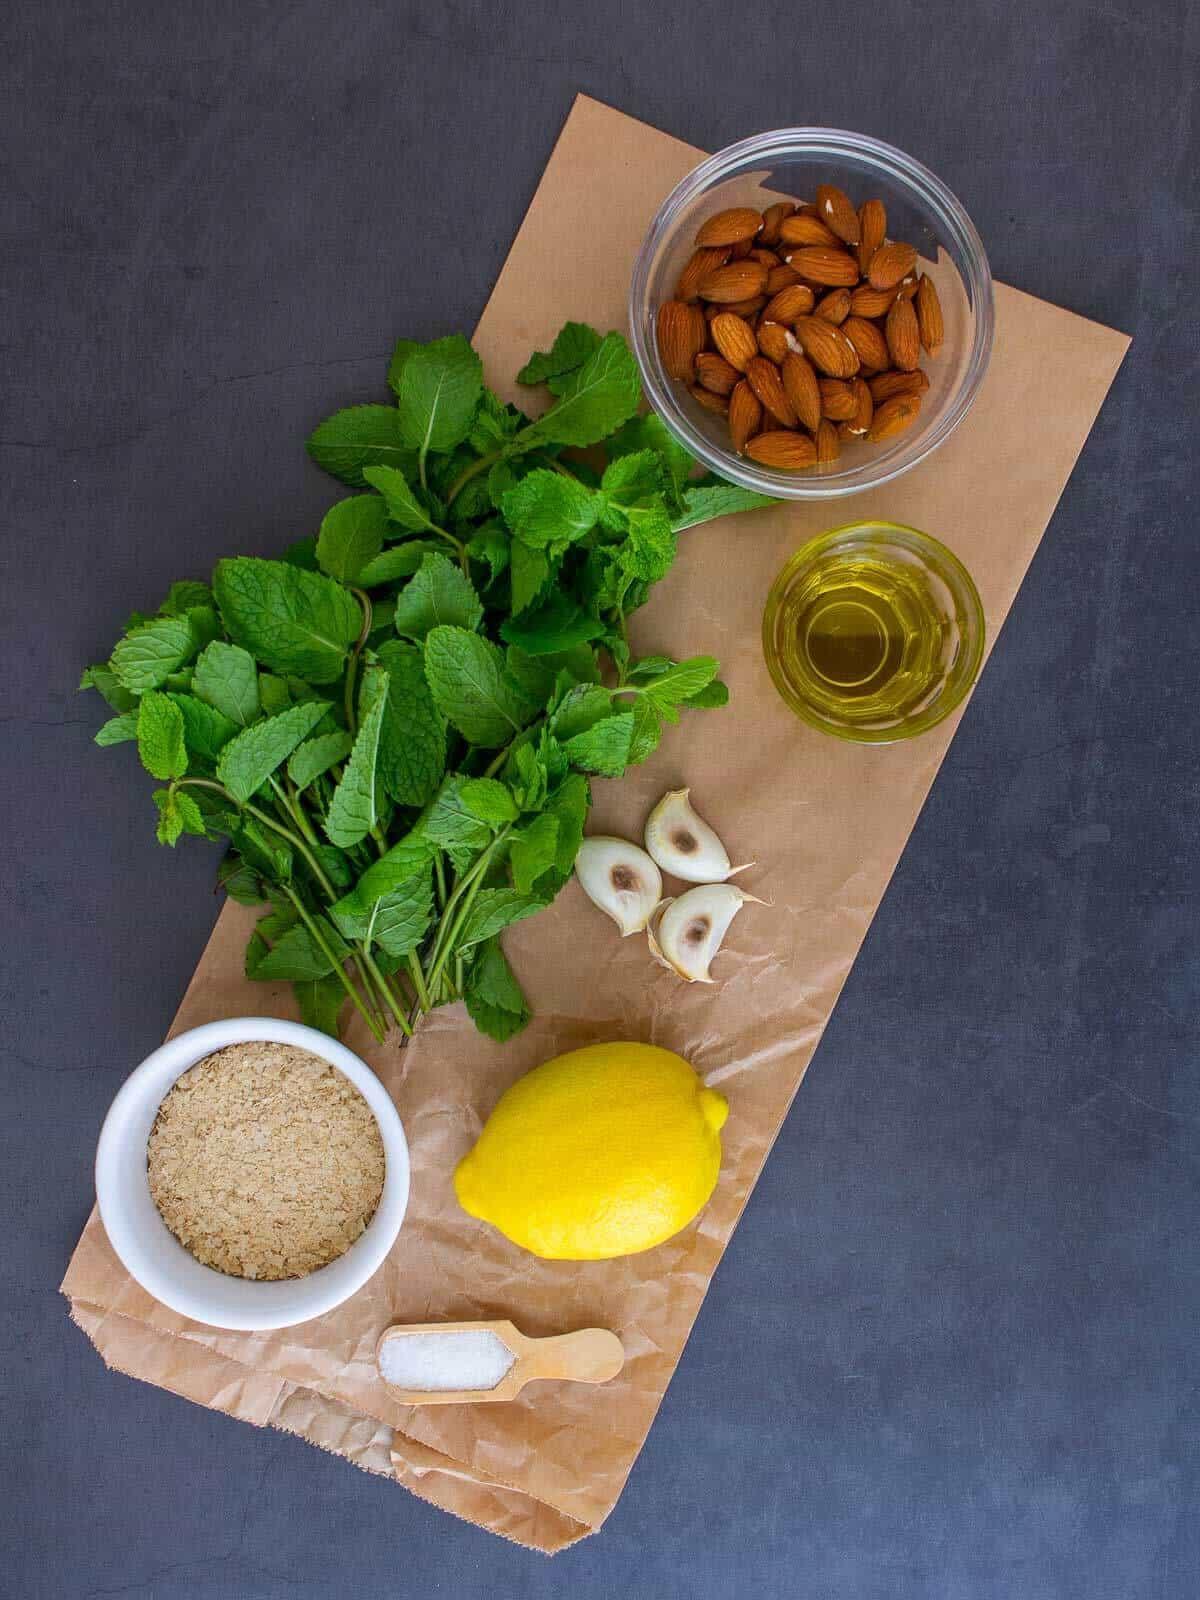 mint pesto ingredients